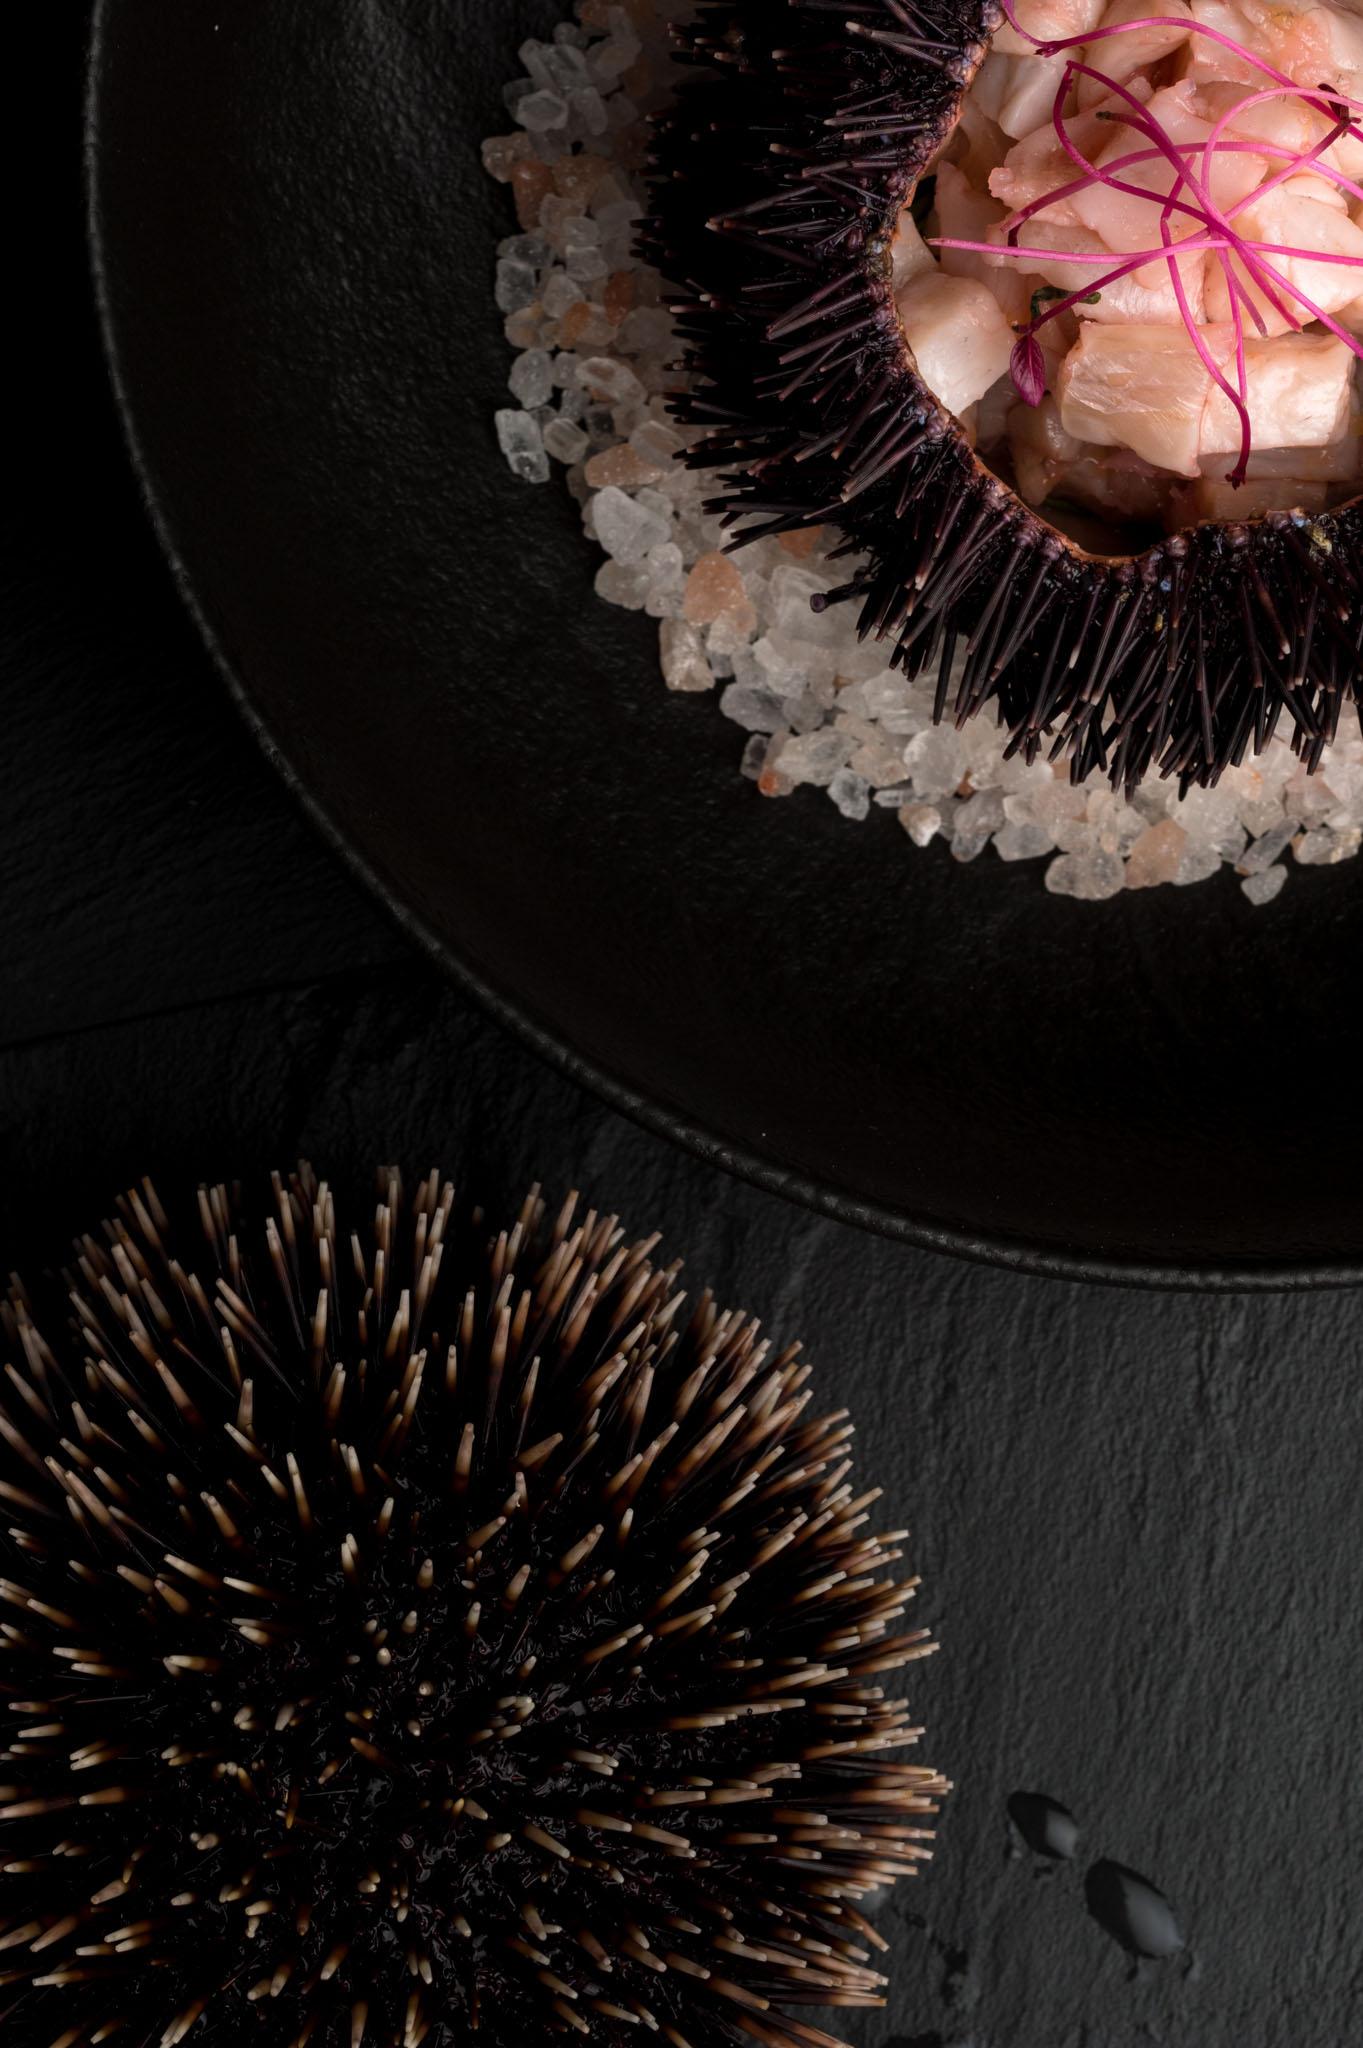 hren | plethora of creativity // AquaSolis food photography